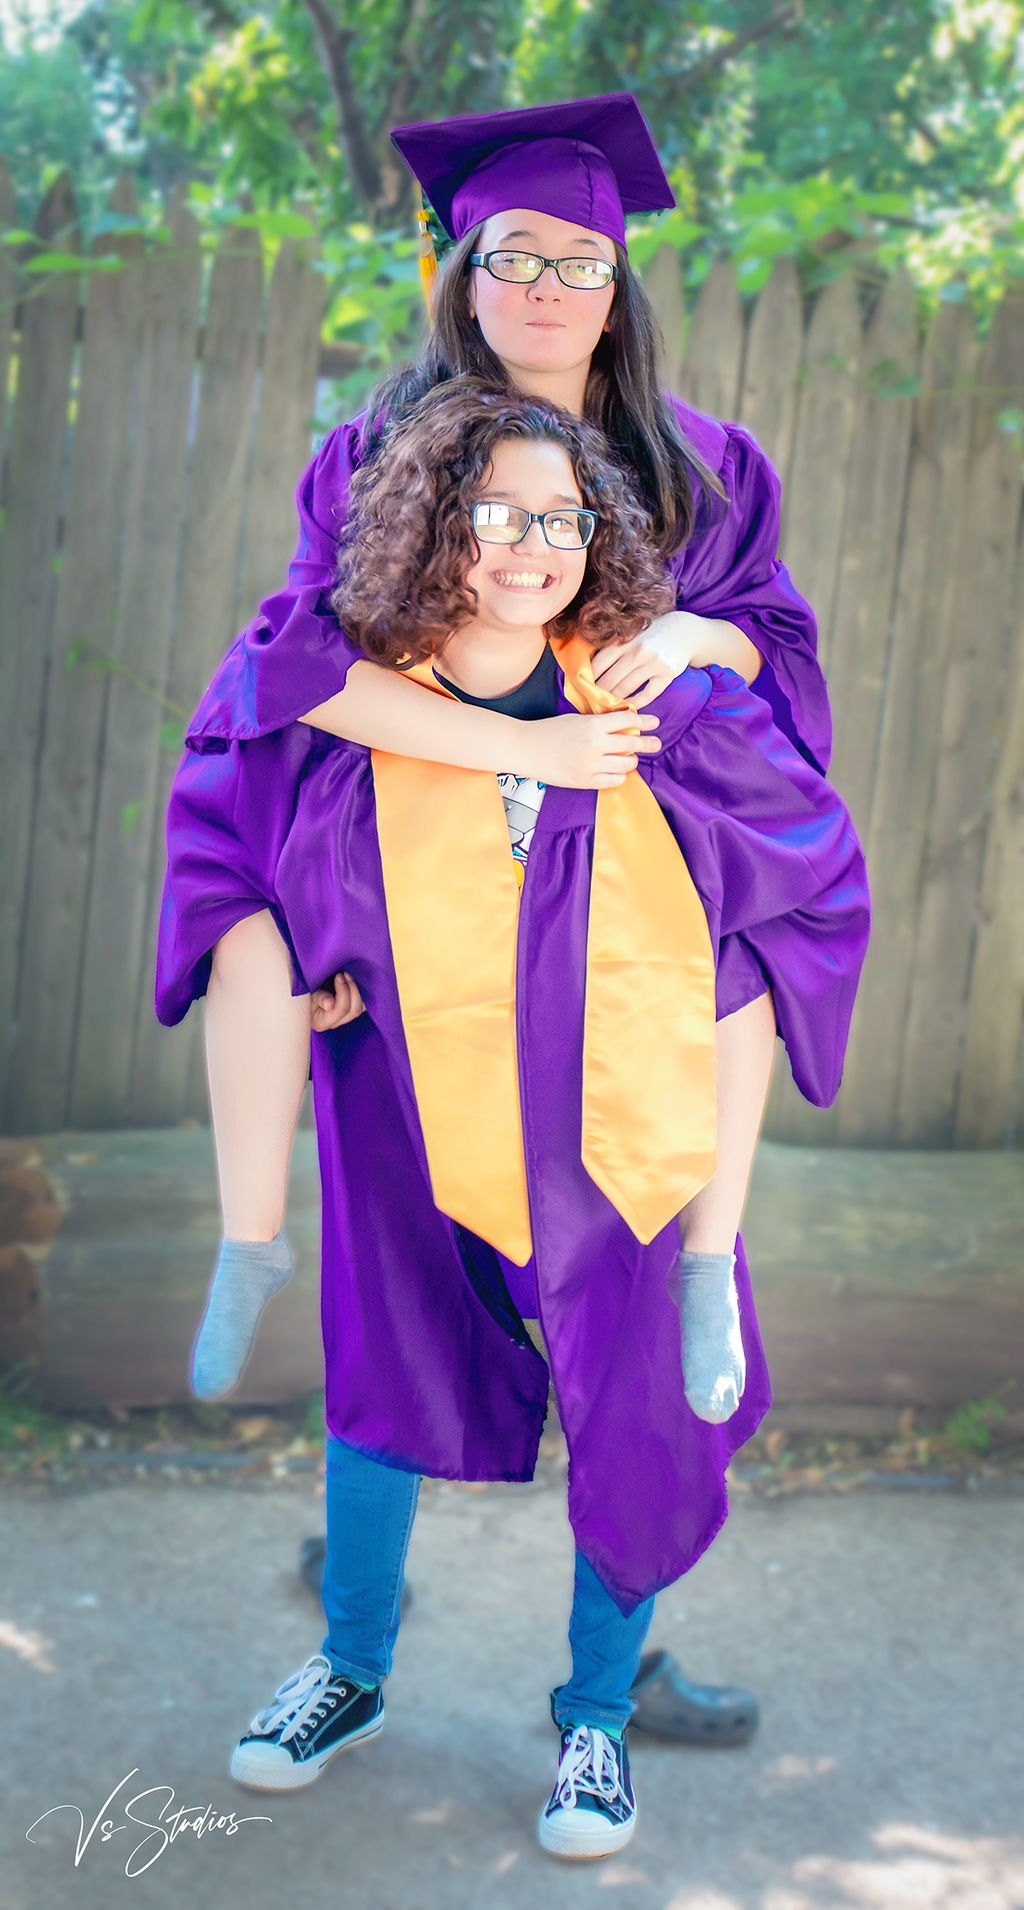 2020 Graduates backyard shoot